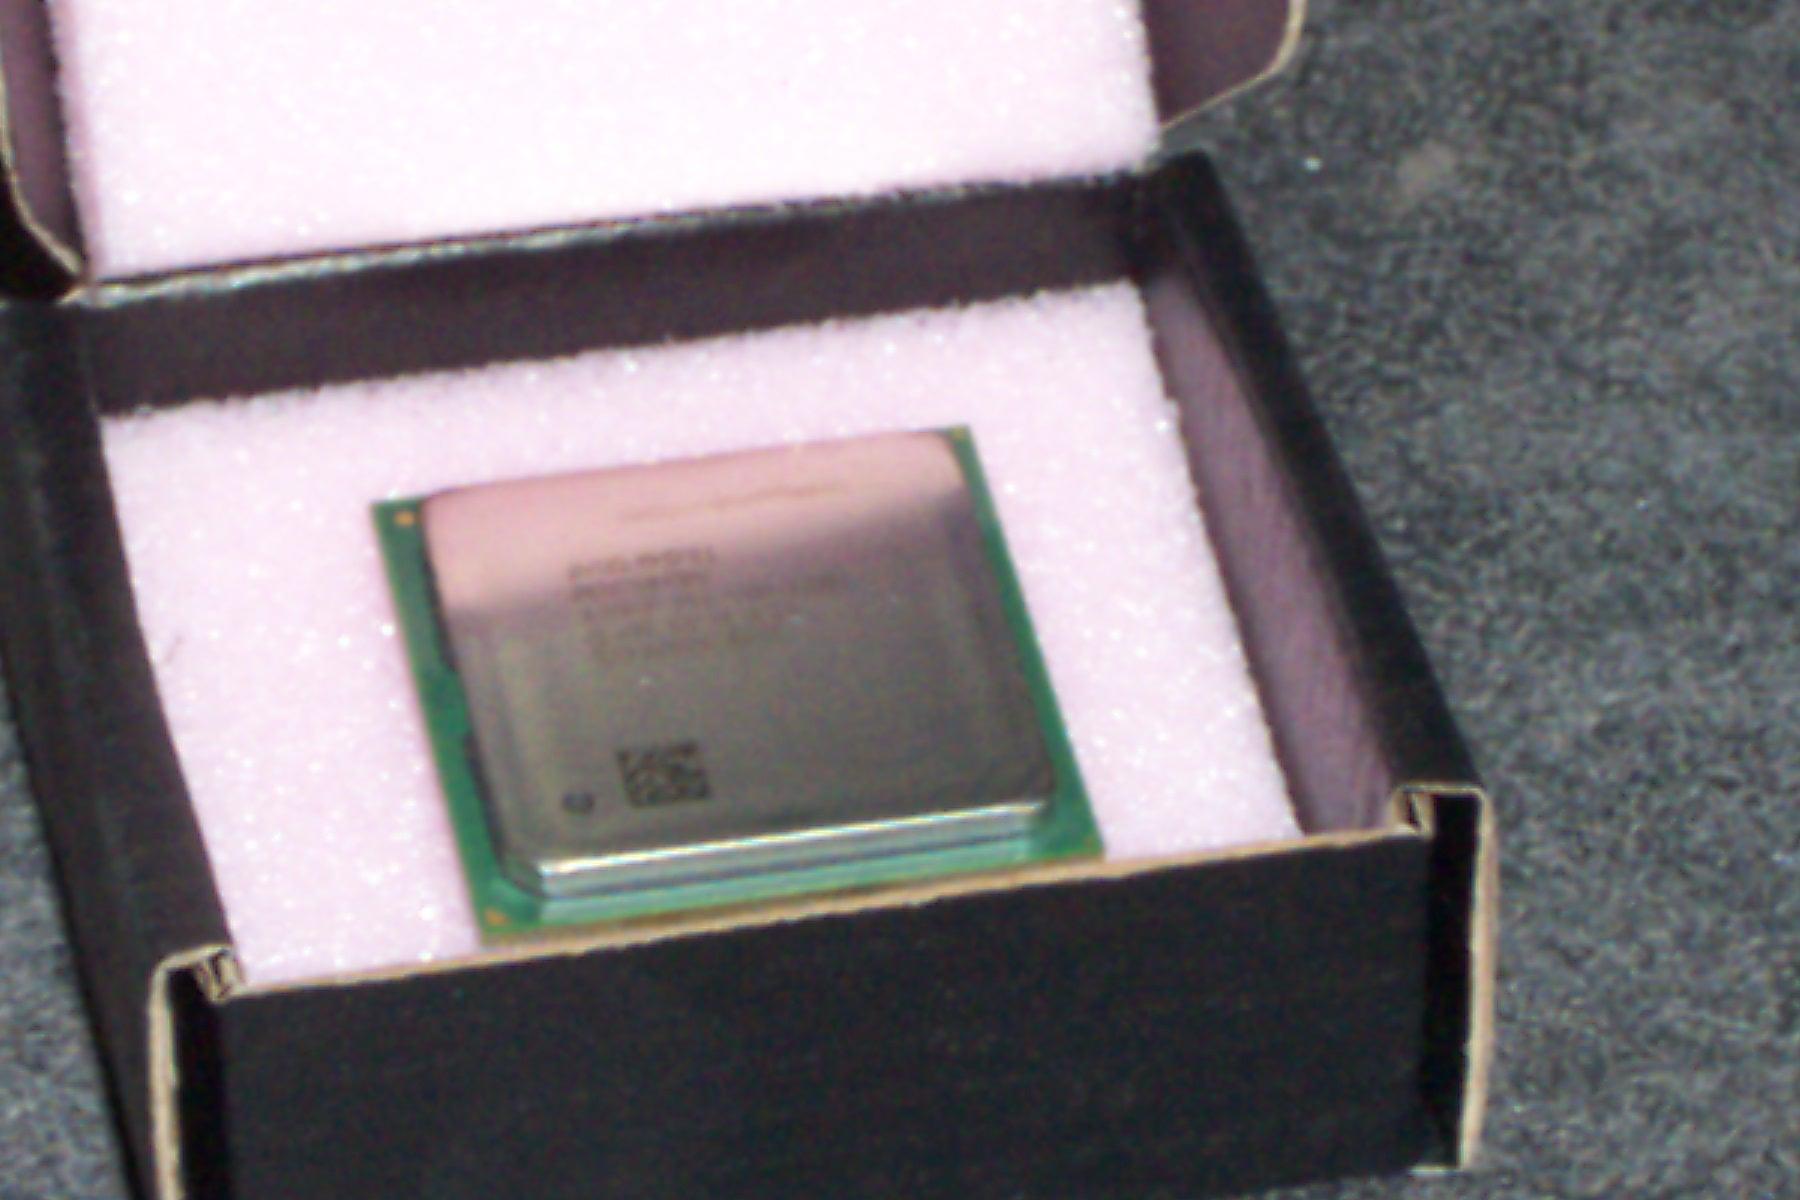 Intel SL6BD Pentium 4 1.7GHz Socket 478 Processor